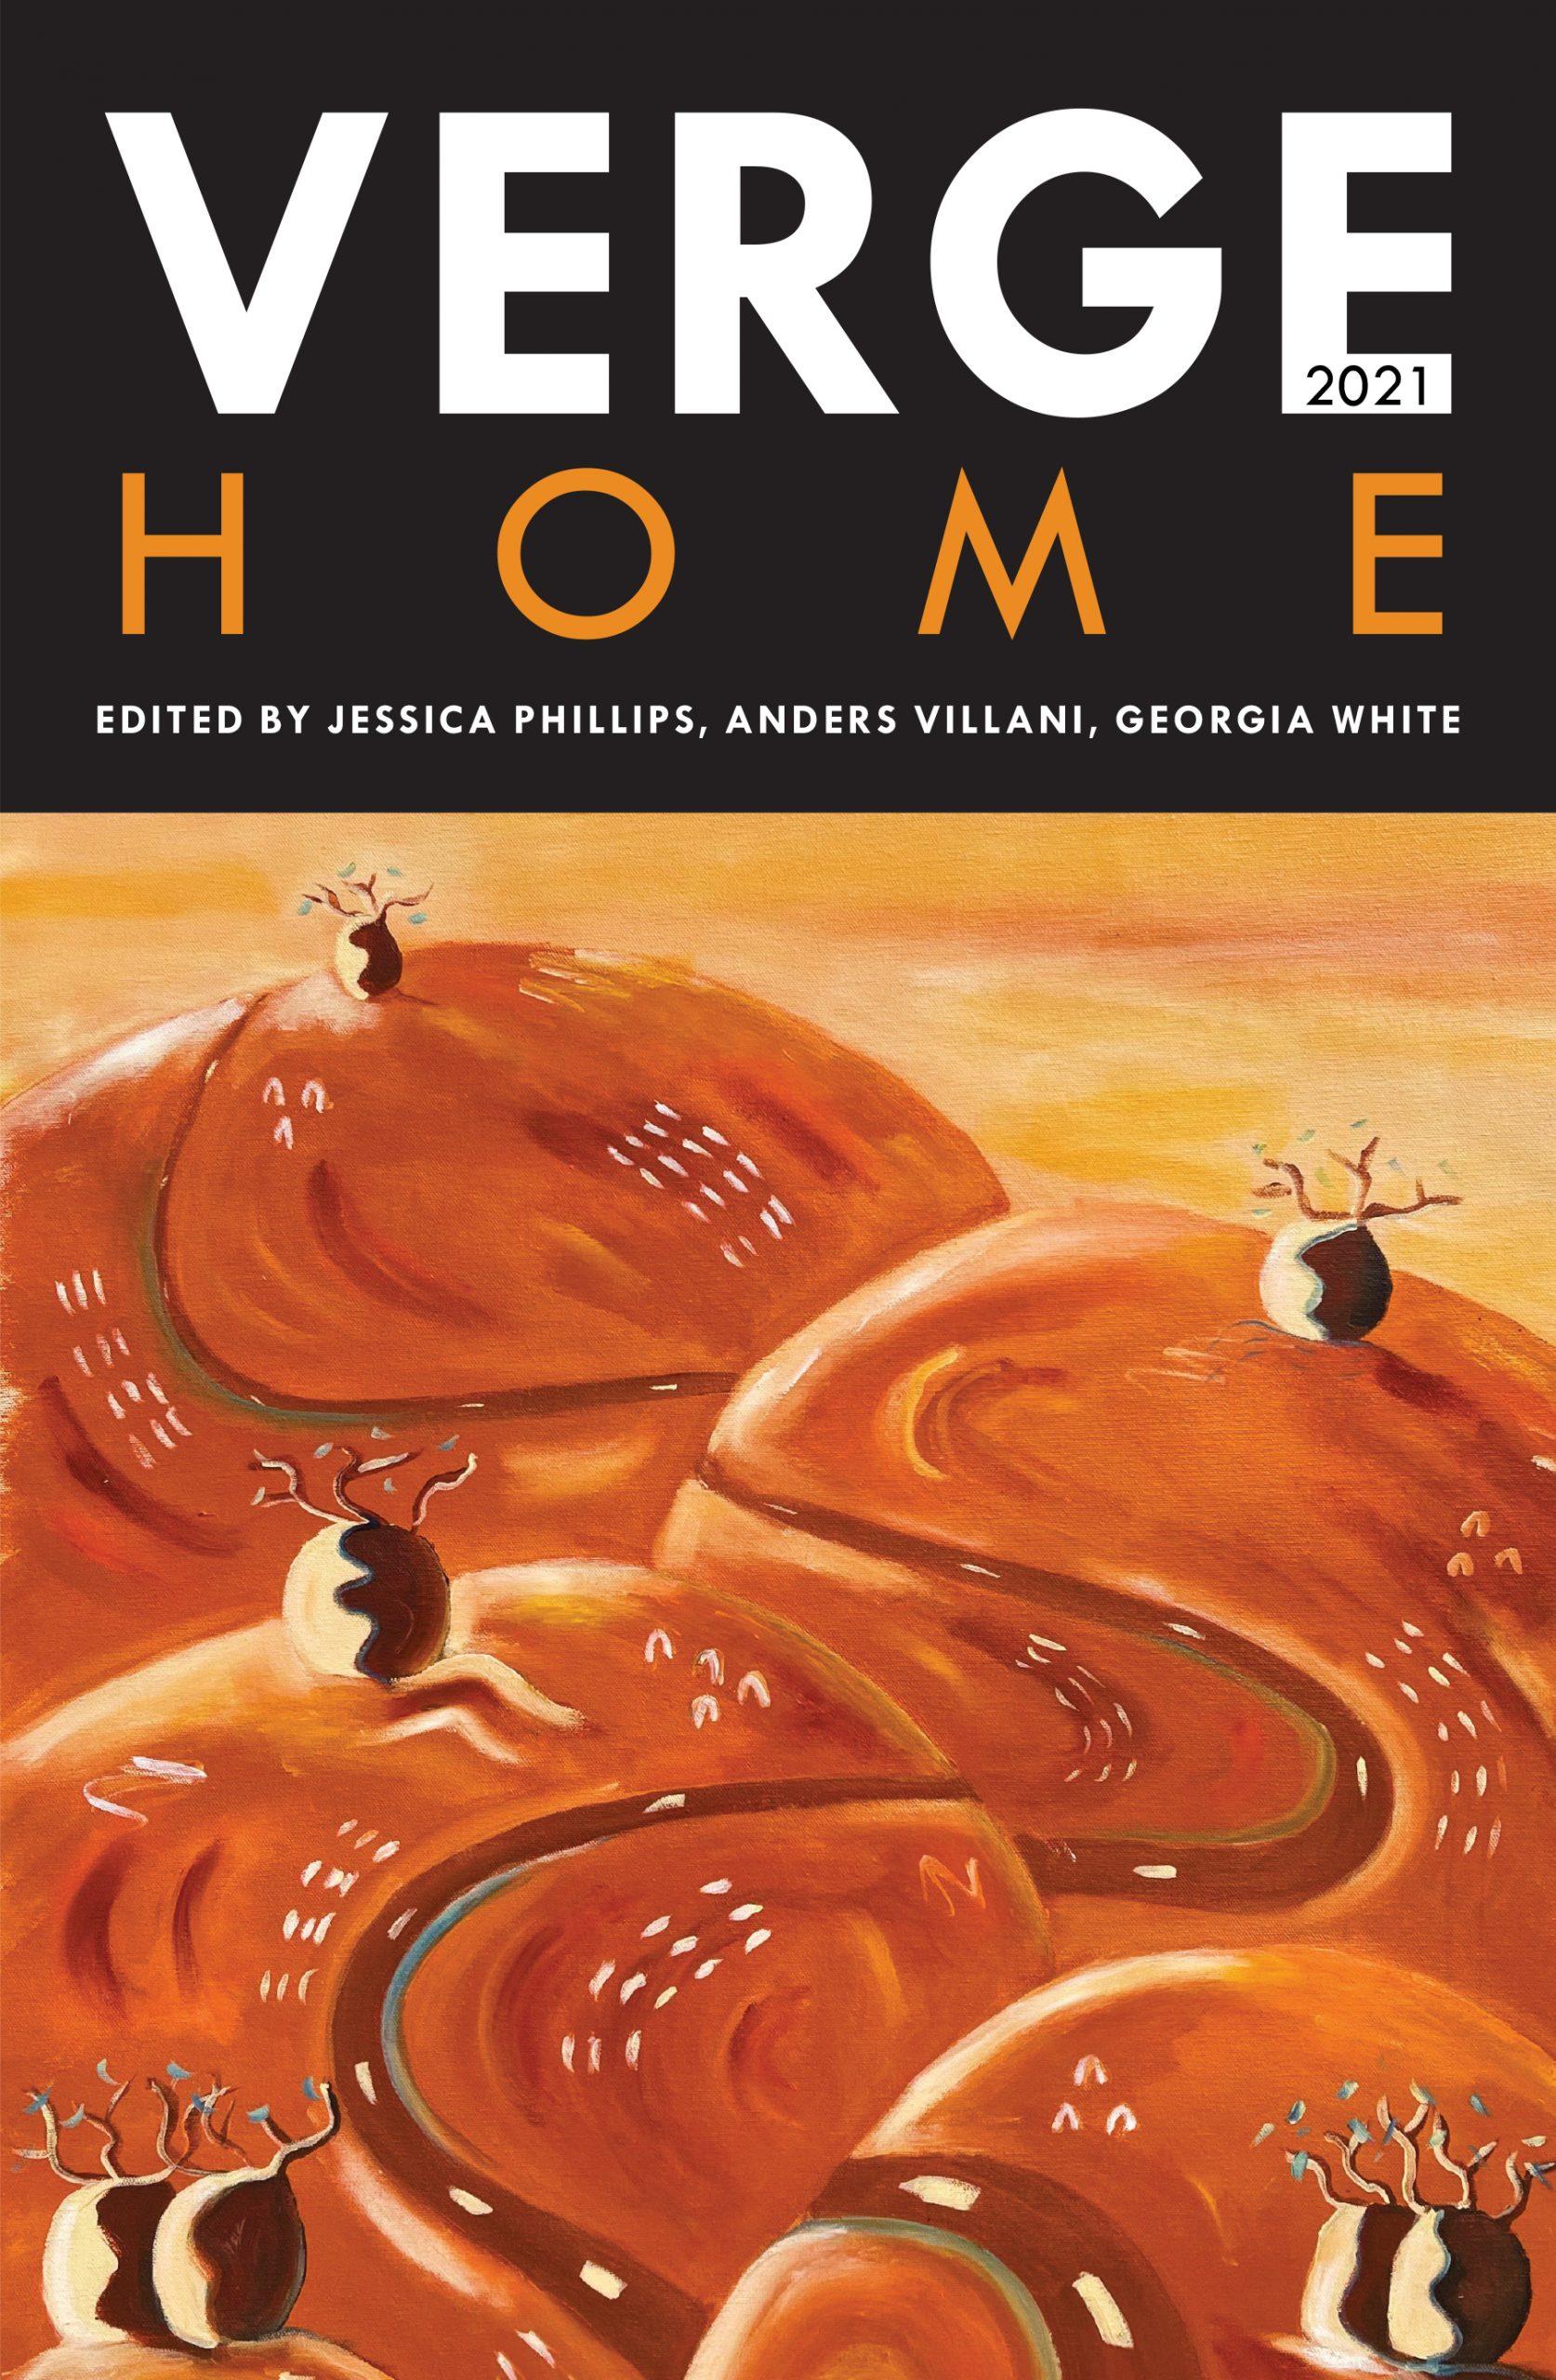 Verge 2021: Home